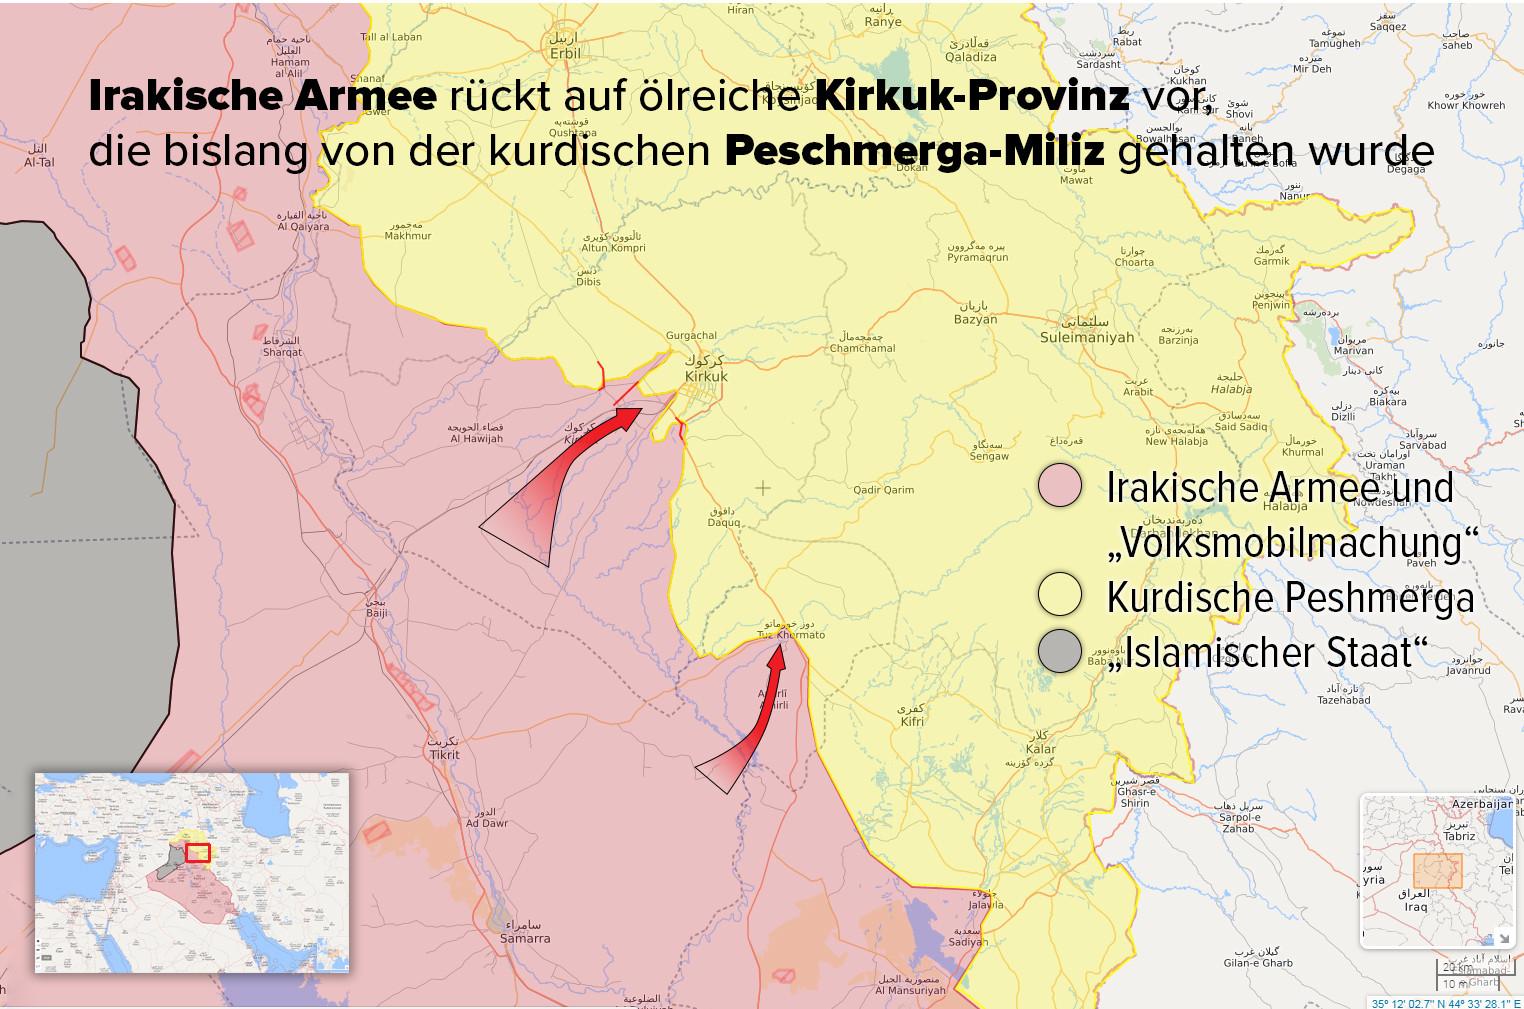 Eskalation nach Referendum: Irakische Armee rückt in Provinz Kirkuk gegen kurdische Peschmerga vor